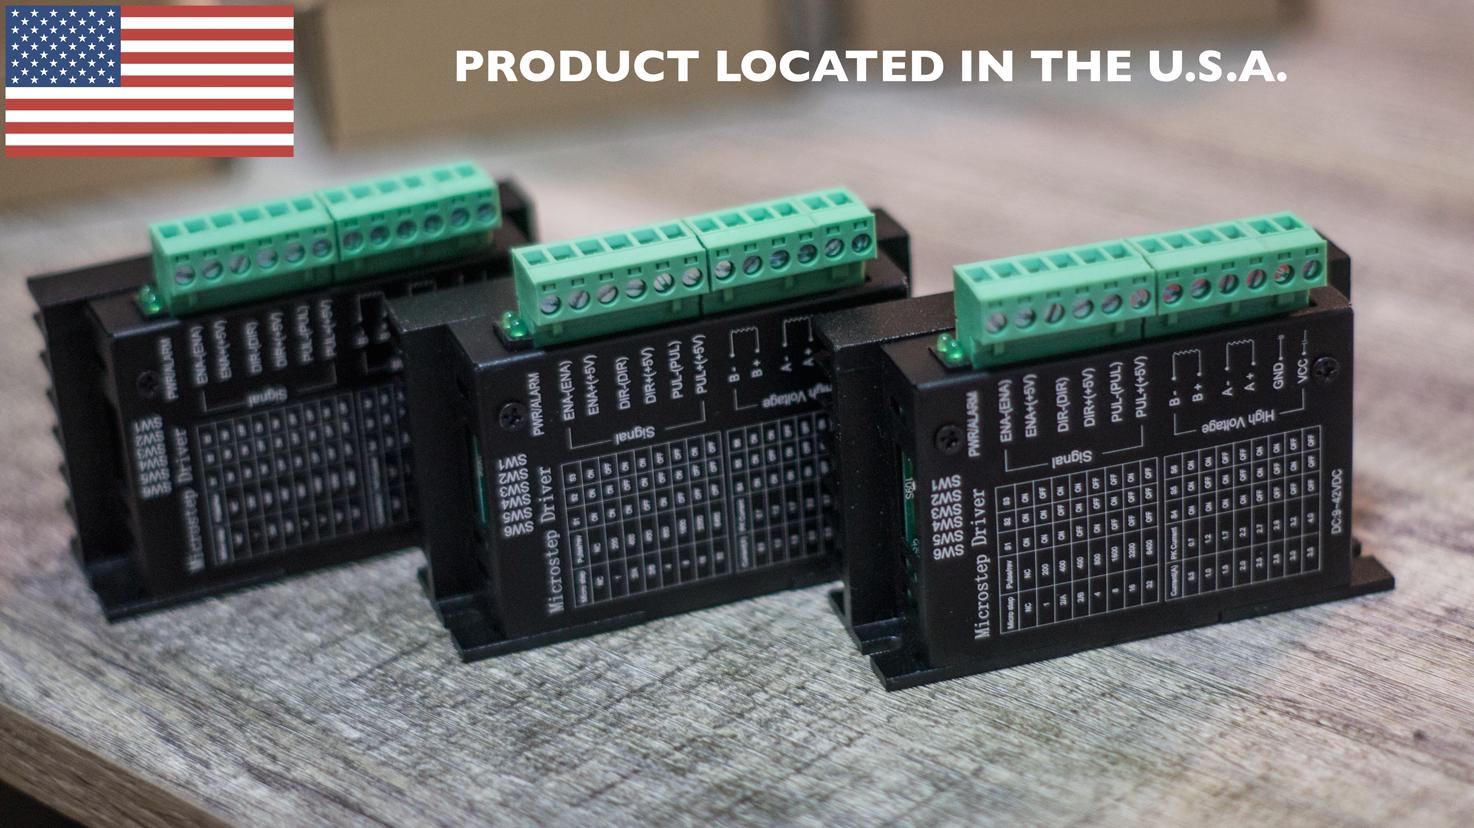 Tb6600 Stepper Motor Driver Cnc Controller For Arduino Nema 17 X3 104086101 Fincor Circuit Board Repair